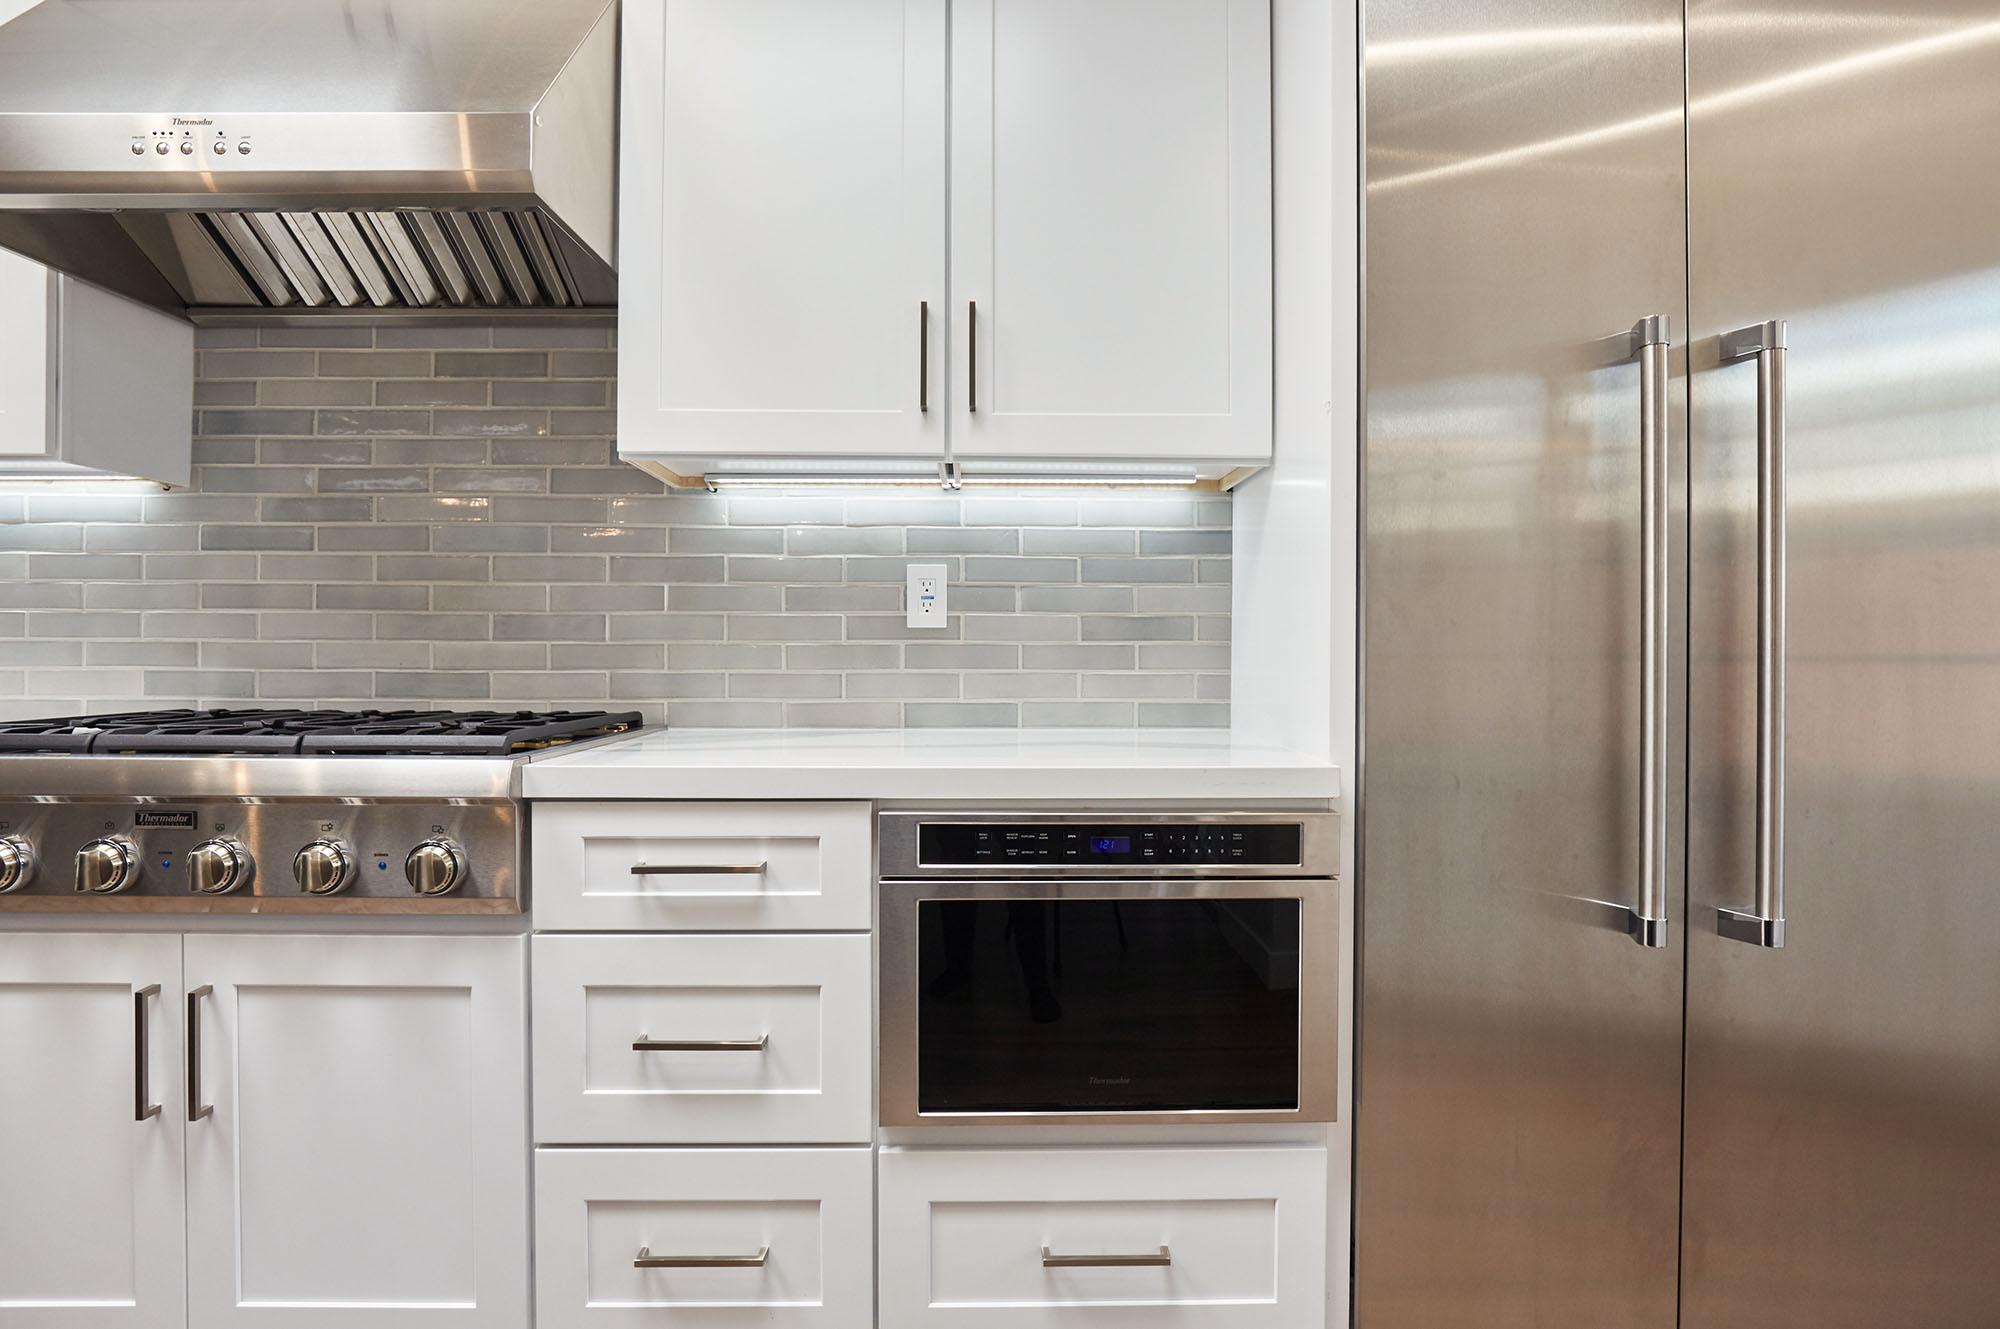 Studio City kitchen remodel 10 SMALL.jpg